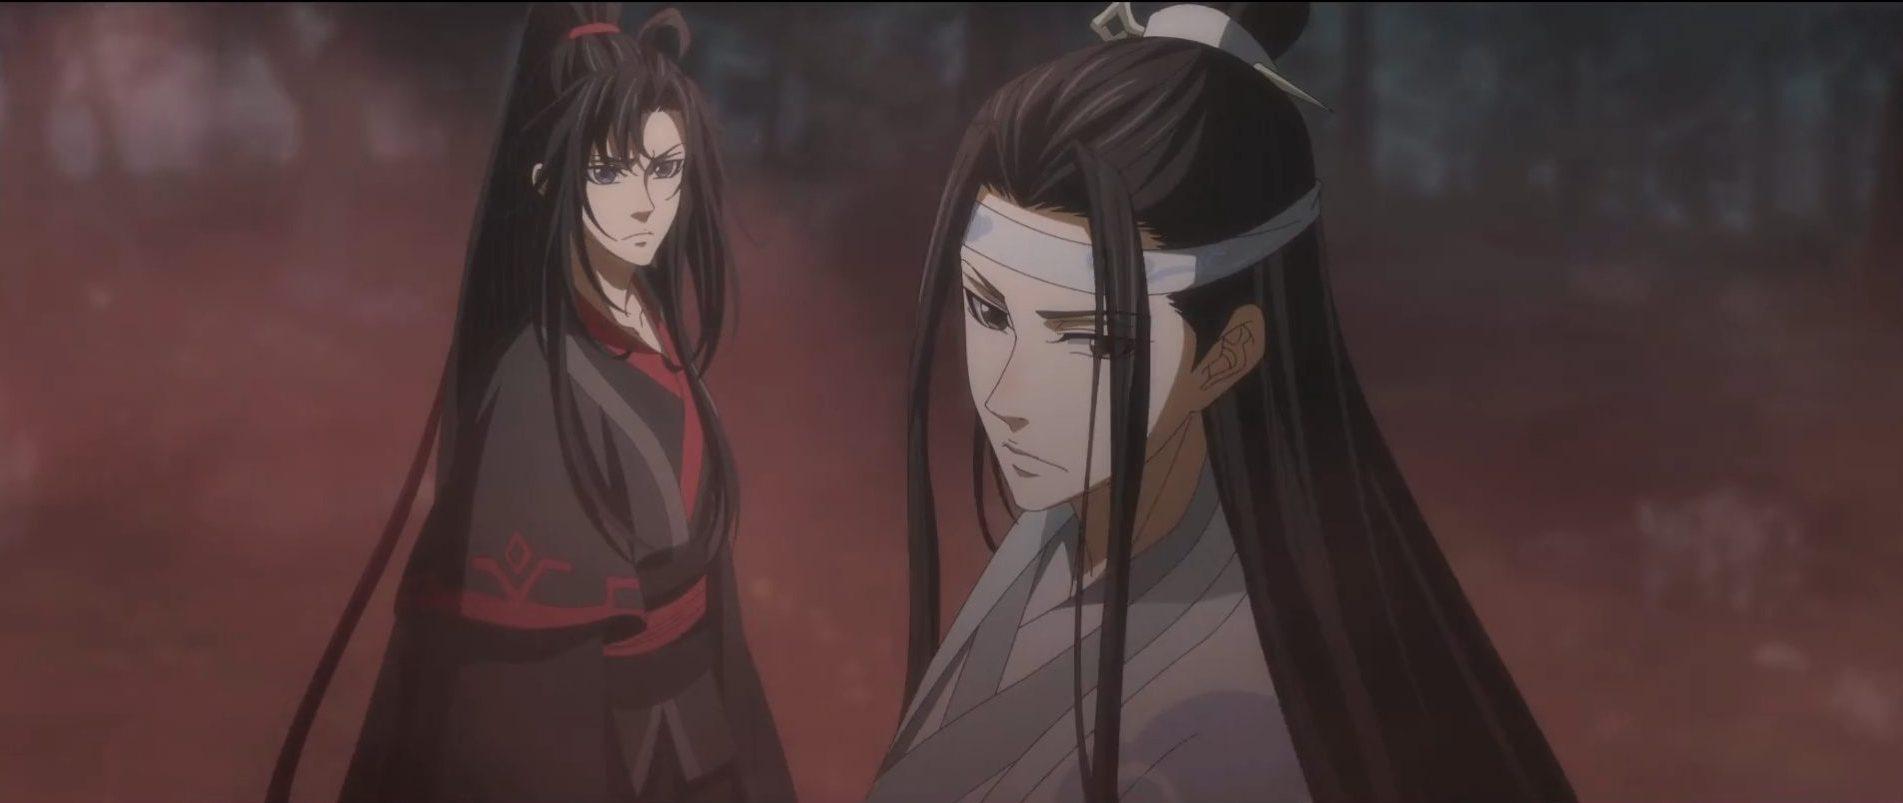 The Ending Of Mo Dao Zu Shi Season 3 Episode 3